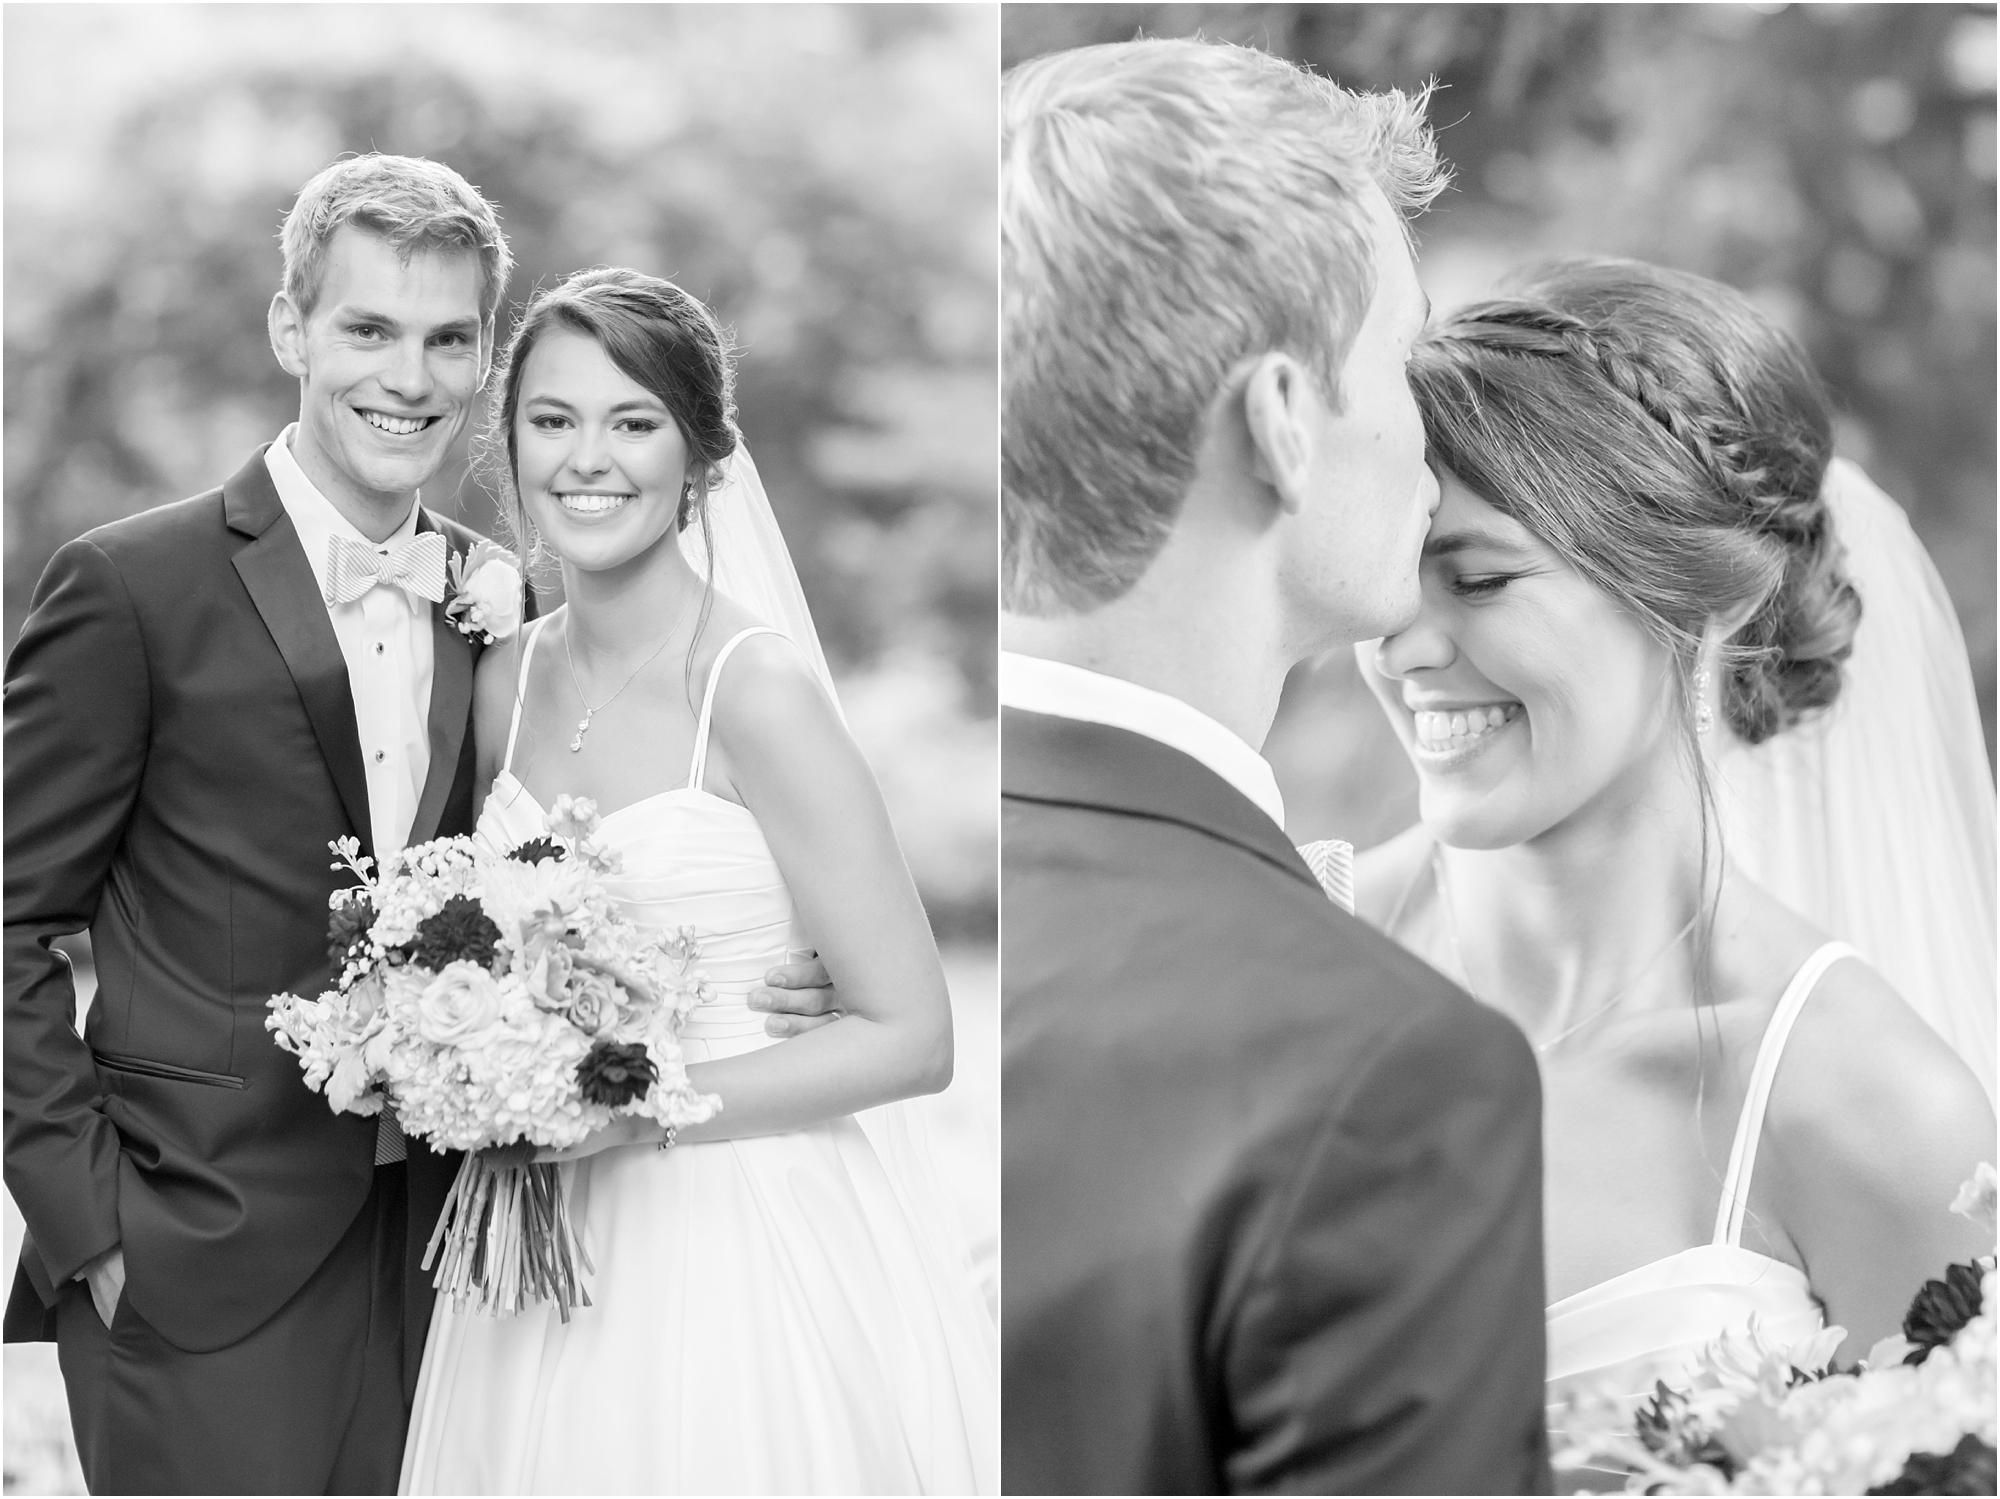 Russell 5-Bride & Groom Portraits-758_anna grace photography baltimore maryland wedding photographer elkridge furnace inn wedding photo.jpg